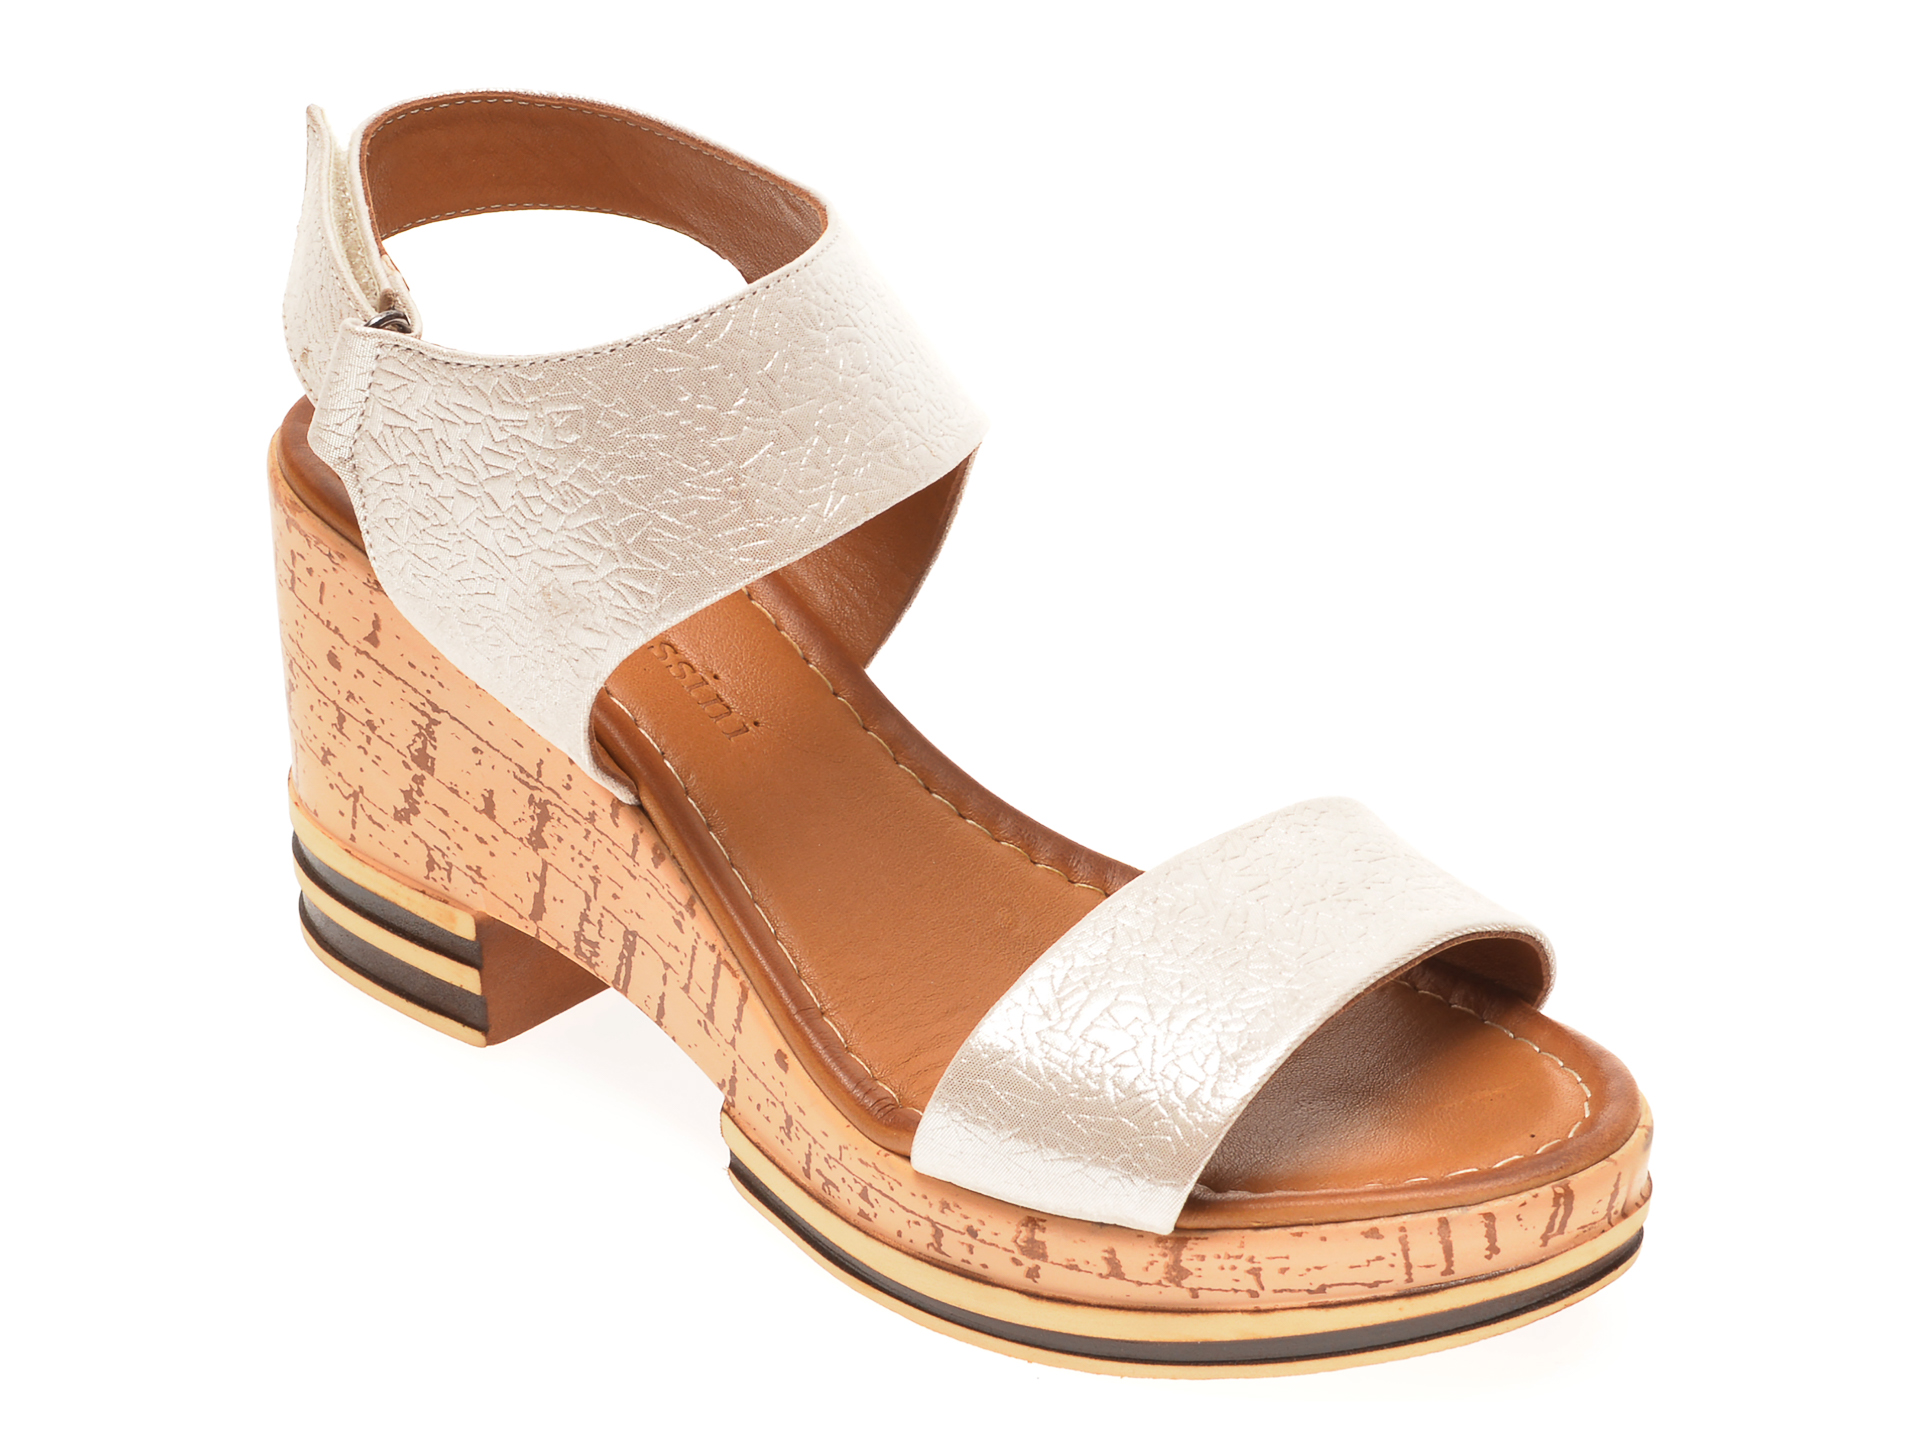 Sandale FLAVIA PASSINI bej, 1182725, din piele naturala